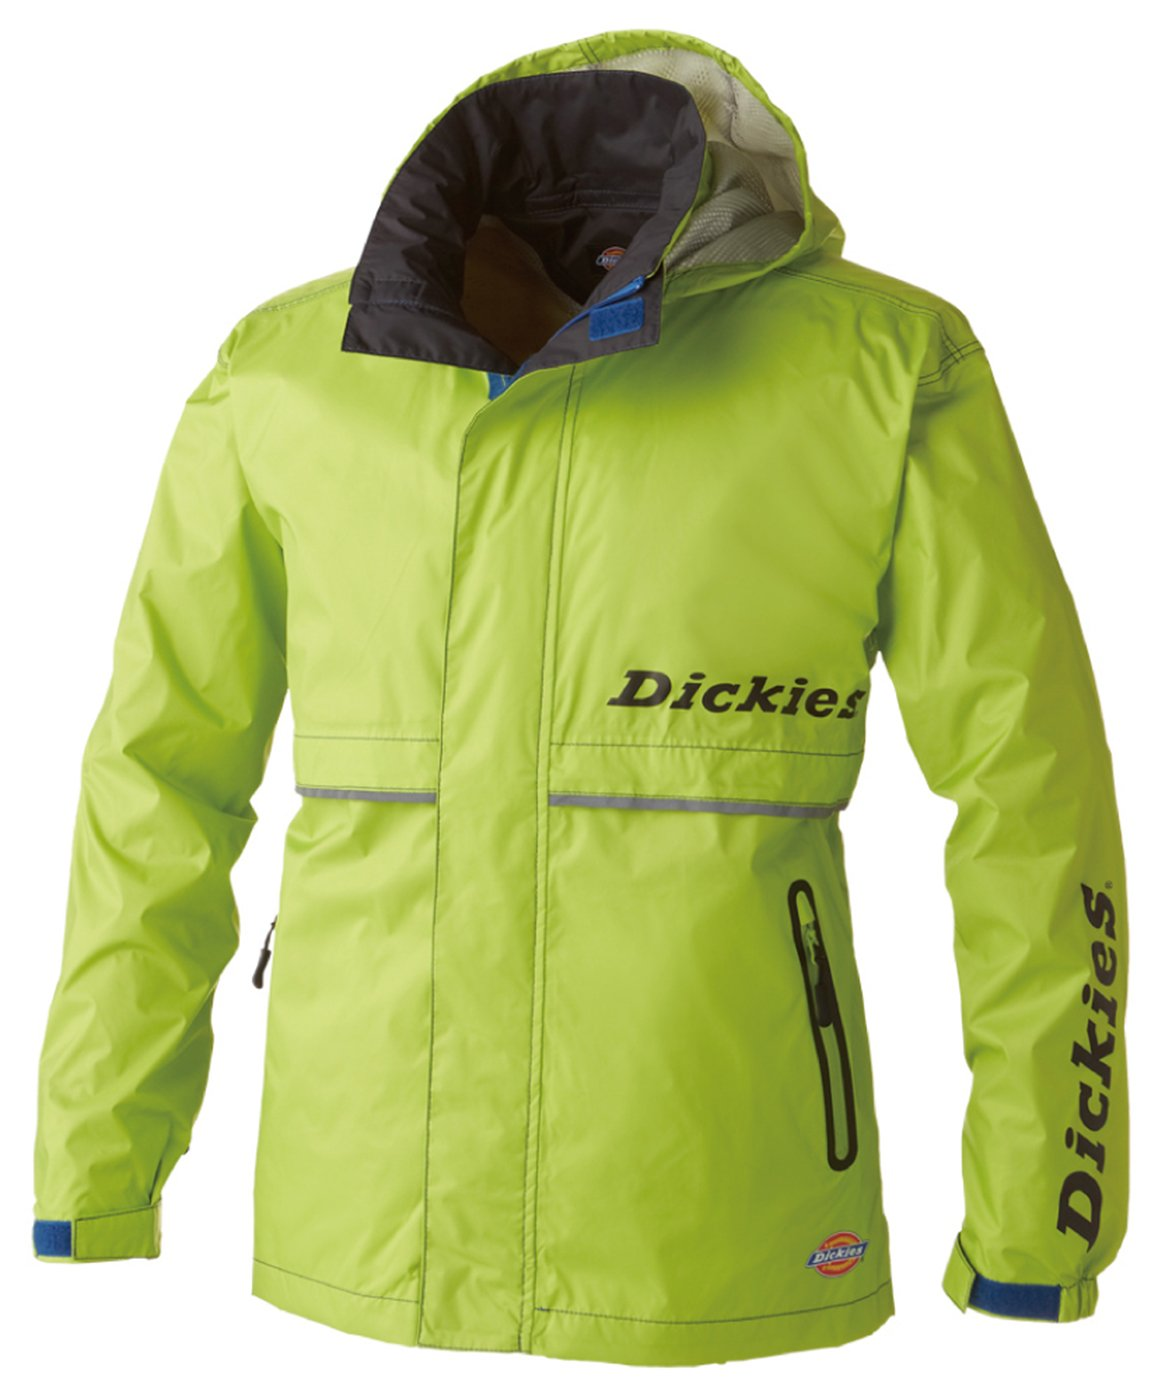 Dickies(ディッキーズ) Dickies レインウェア 上着 合羽 メンズ cc-d3505 B078TQ4MQY 3L|ライム ライム 3L